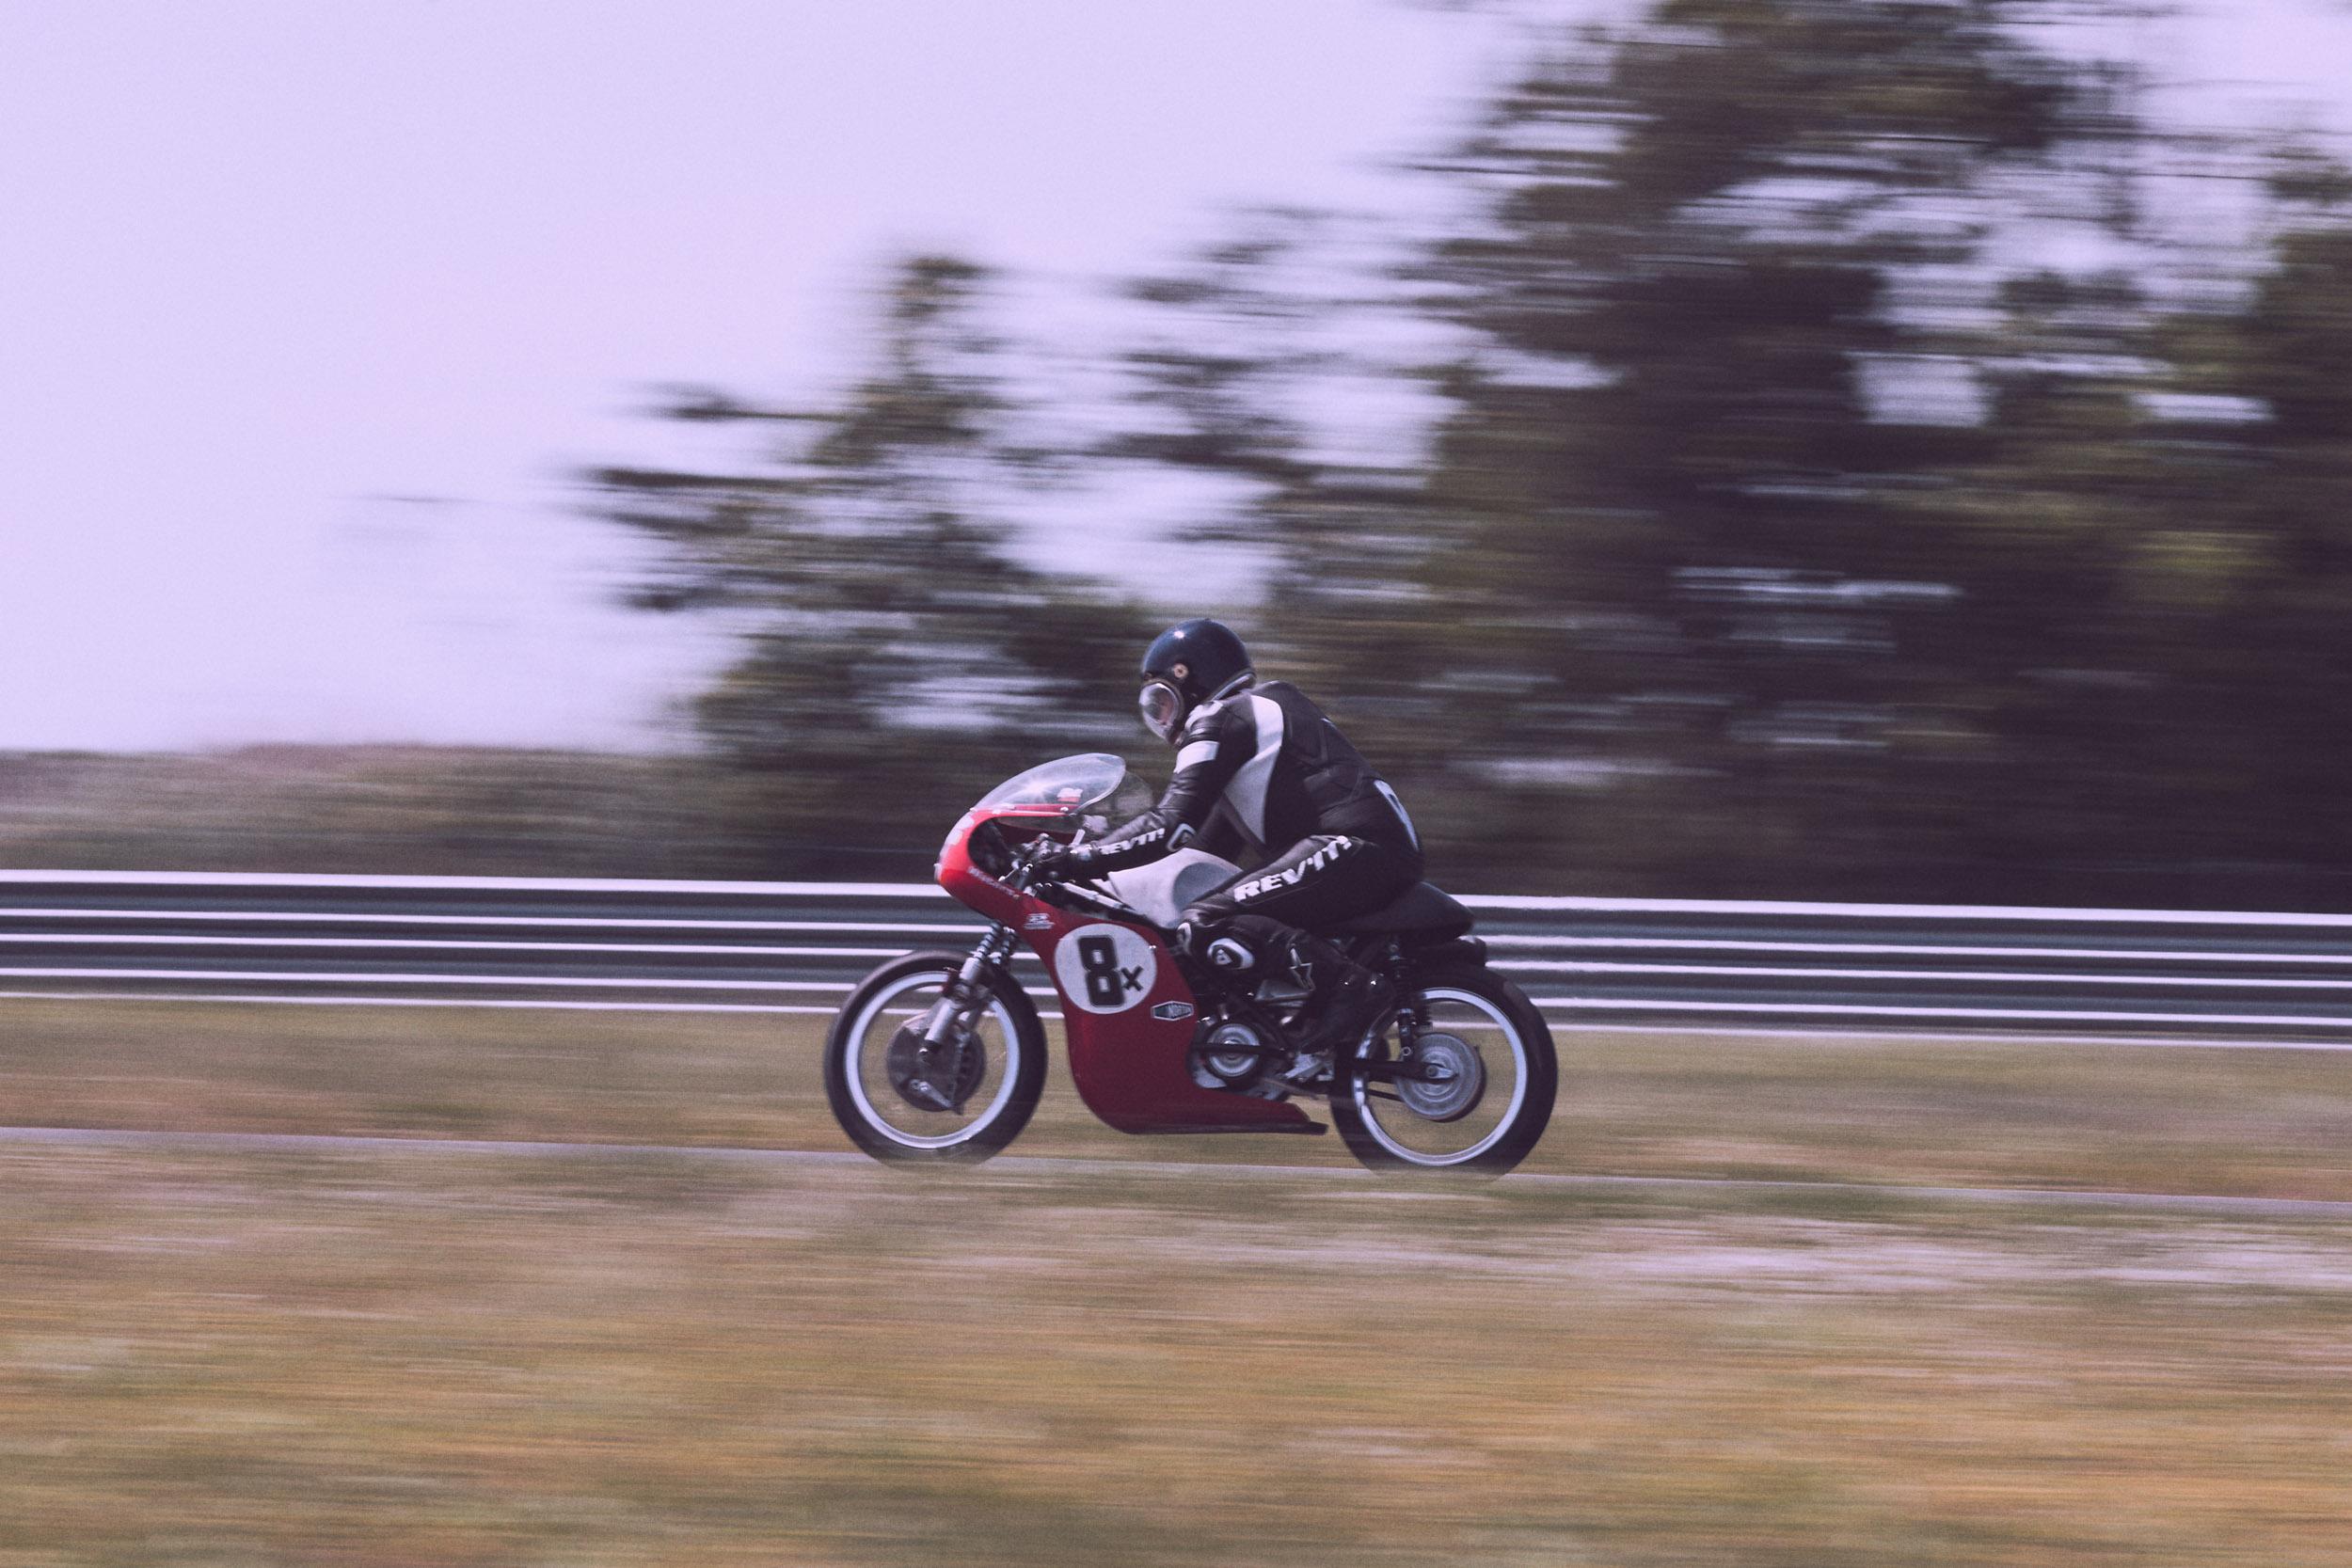 RHandt_190525_NJMP_motoRacing_239.jpg